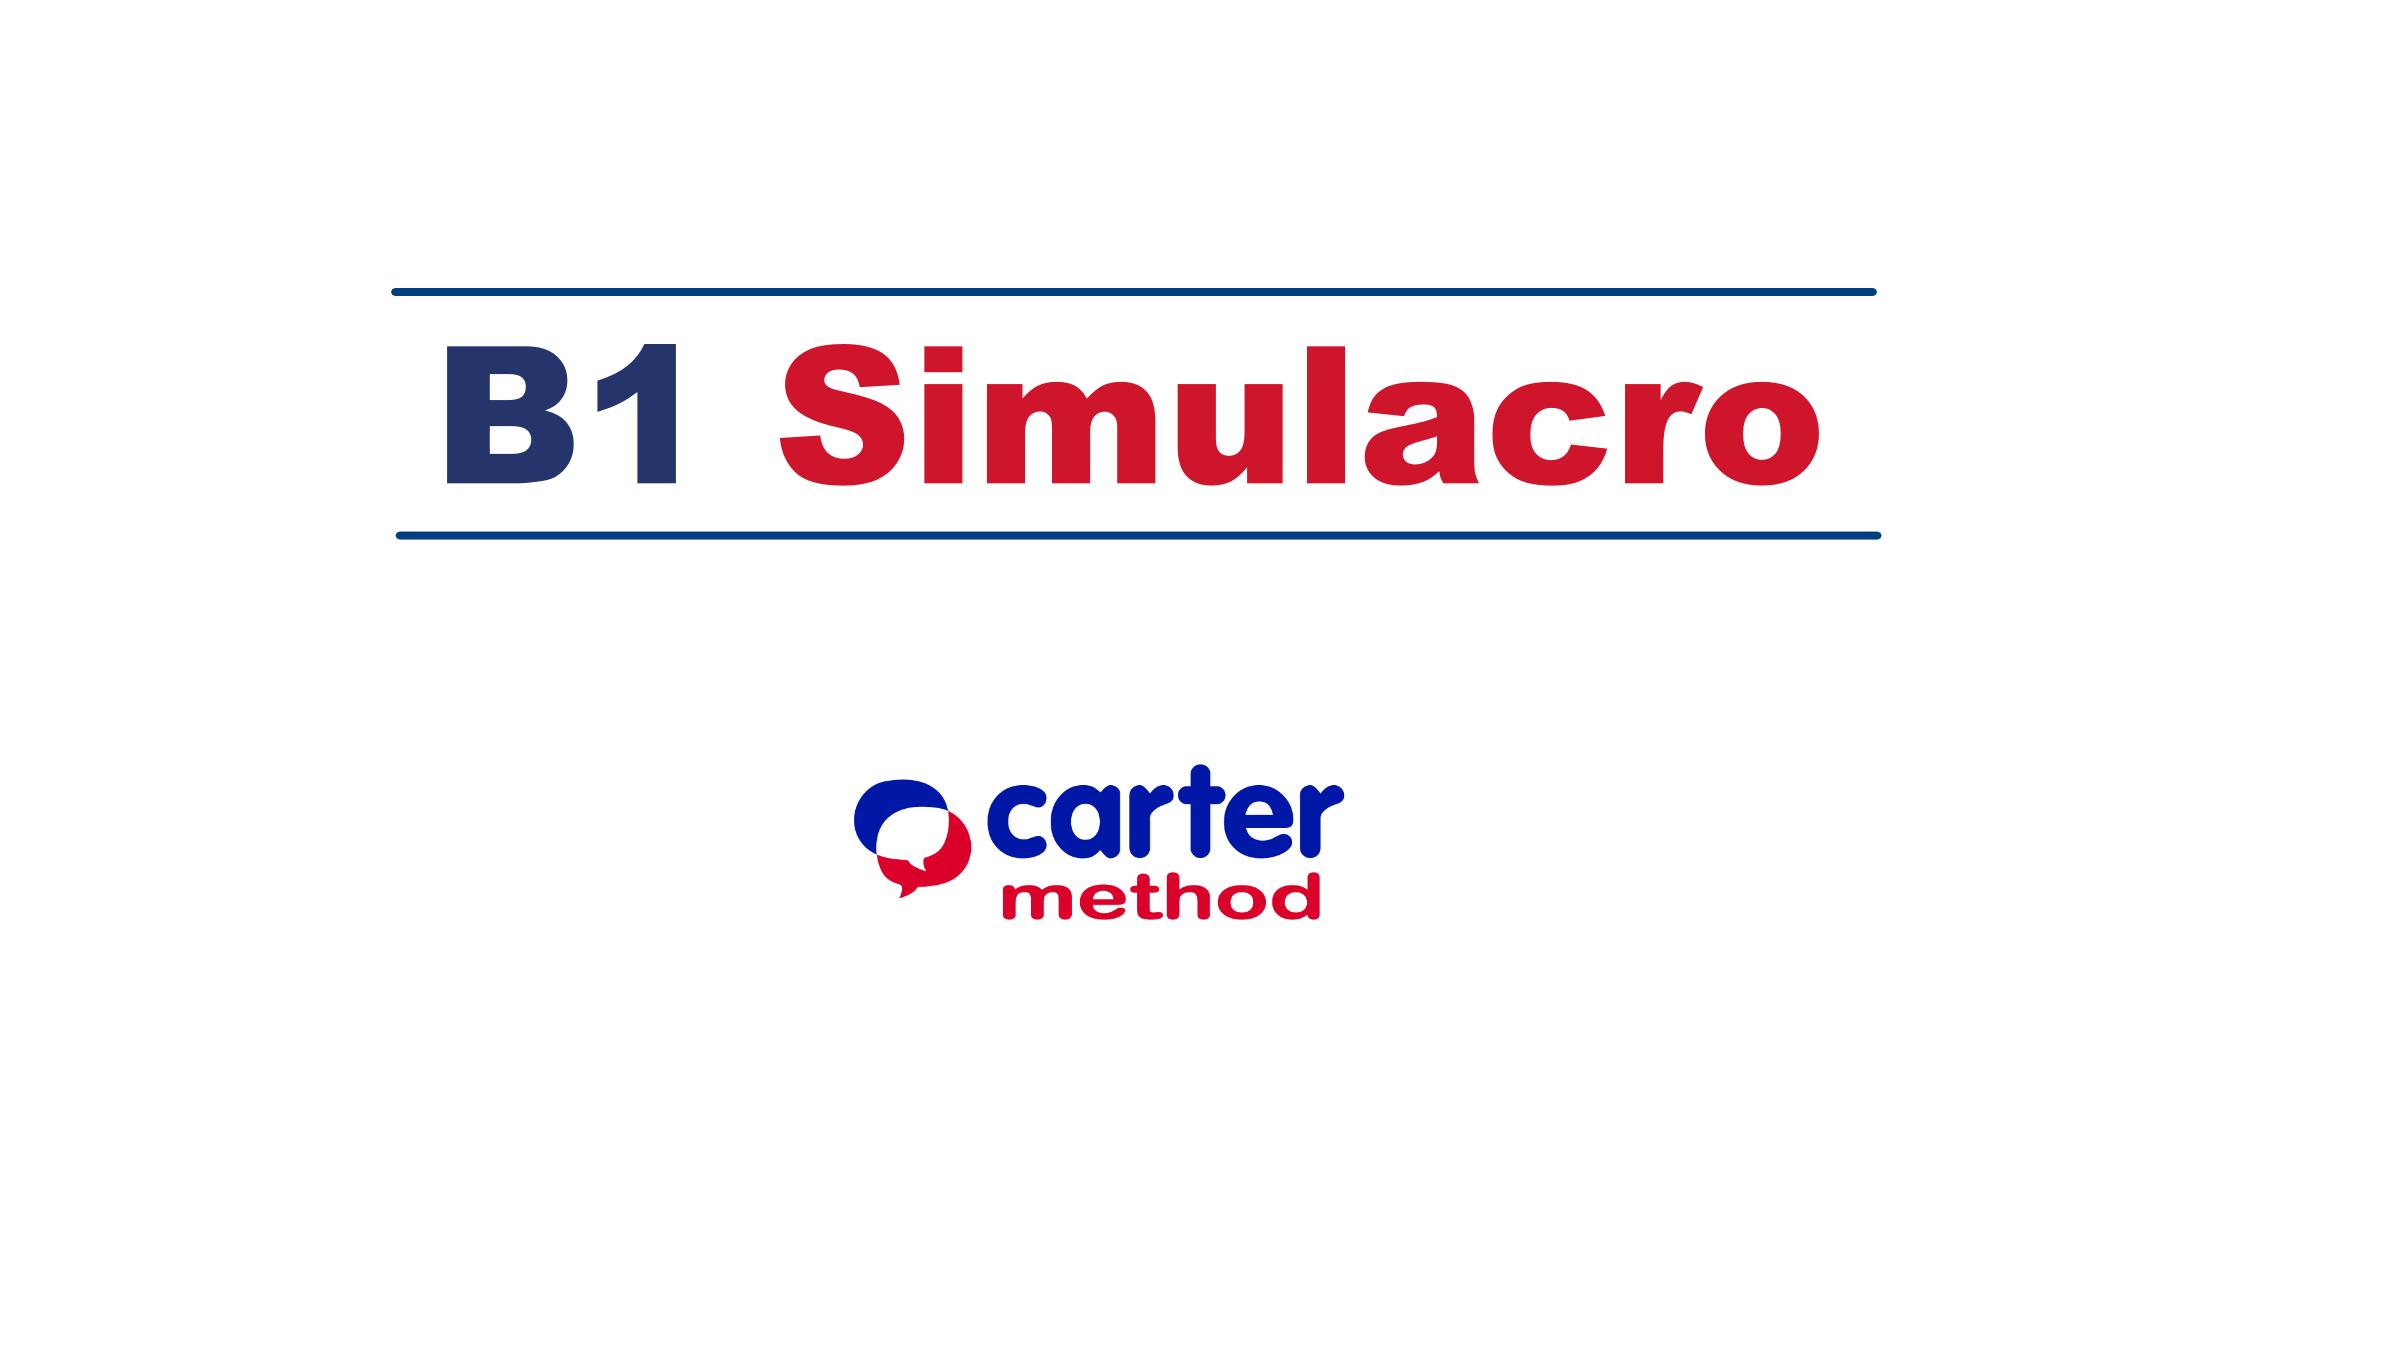 B1 Simulacro (1)